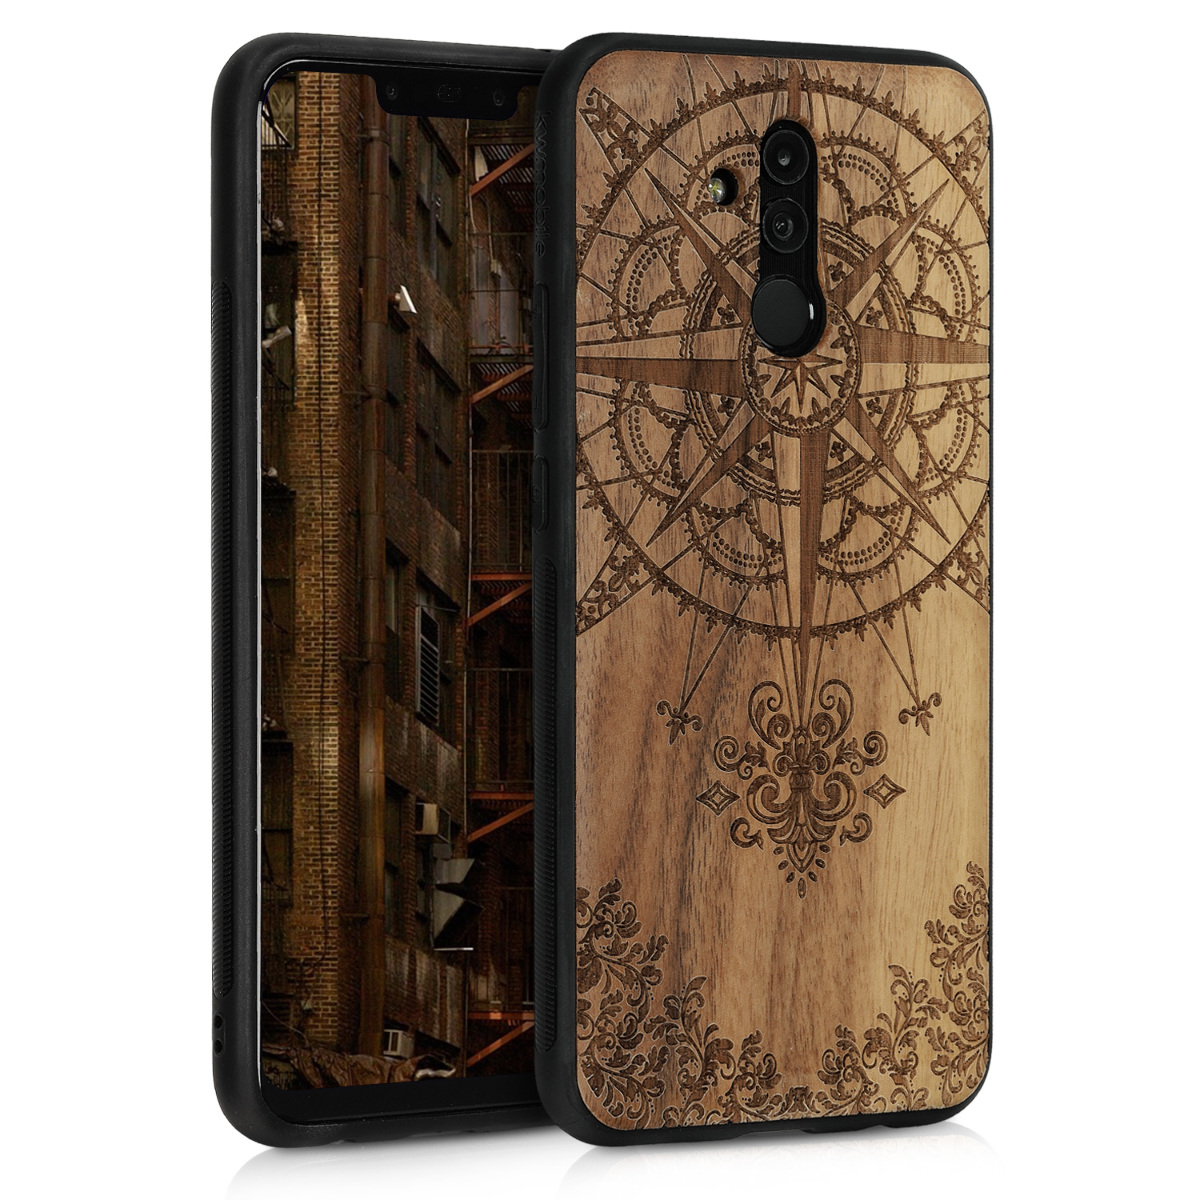 KW Σκληρή Ξύλινη Θήκη Huawei Mate 20 Lite - TPU - Baroque Compass (46637.01)